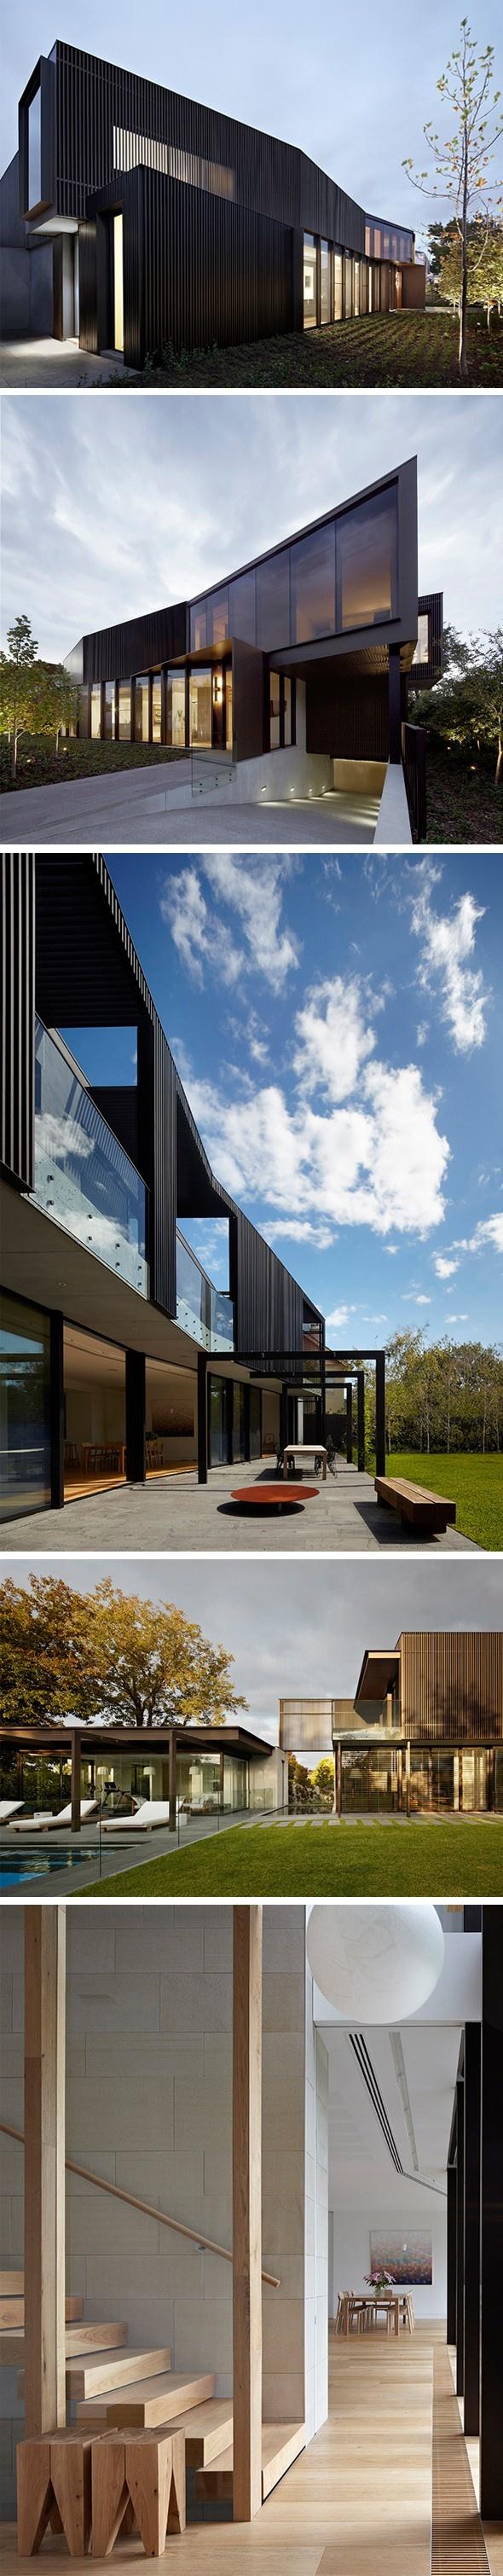 Shrouded House Par Inarc Architects